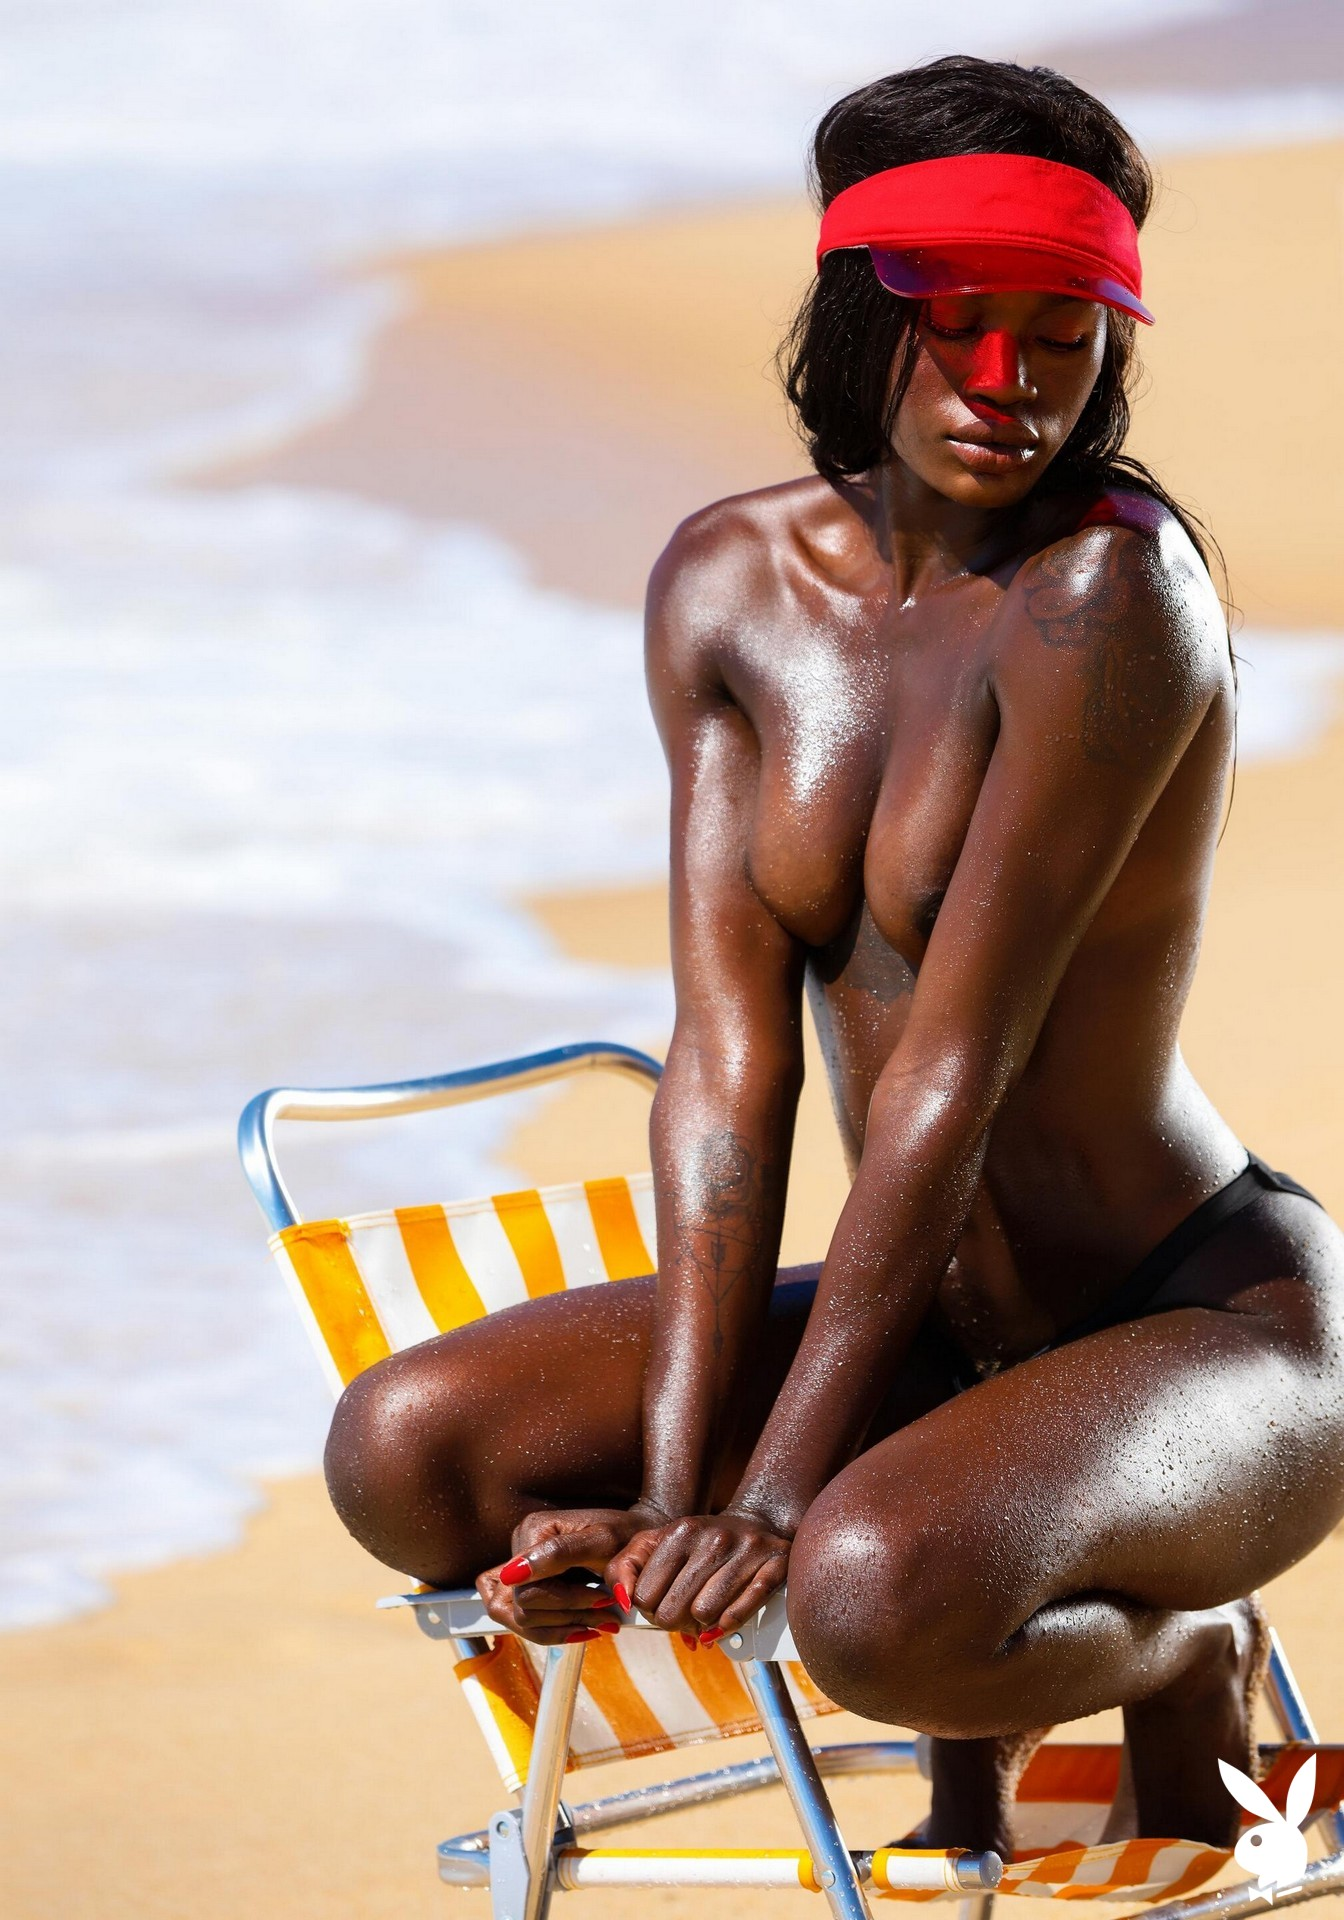 Naomi Nash For Playboy International Vol. 2 Playboy Plus (13)